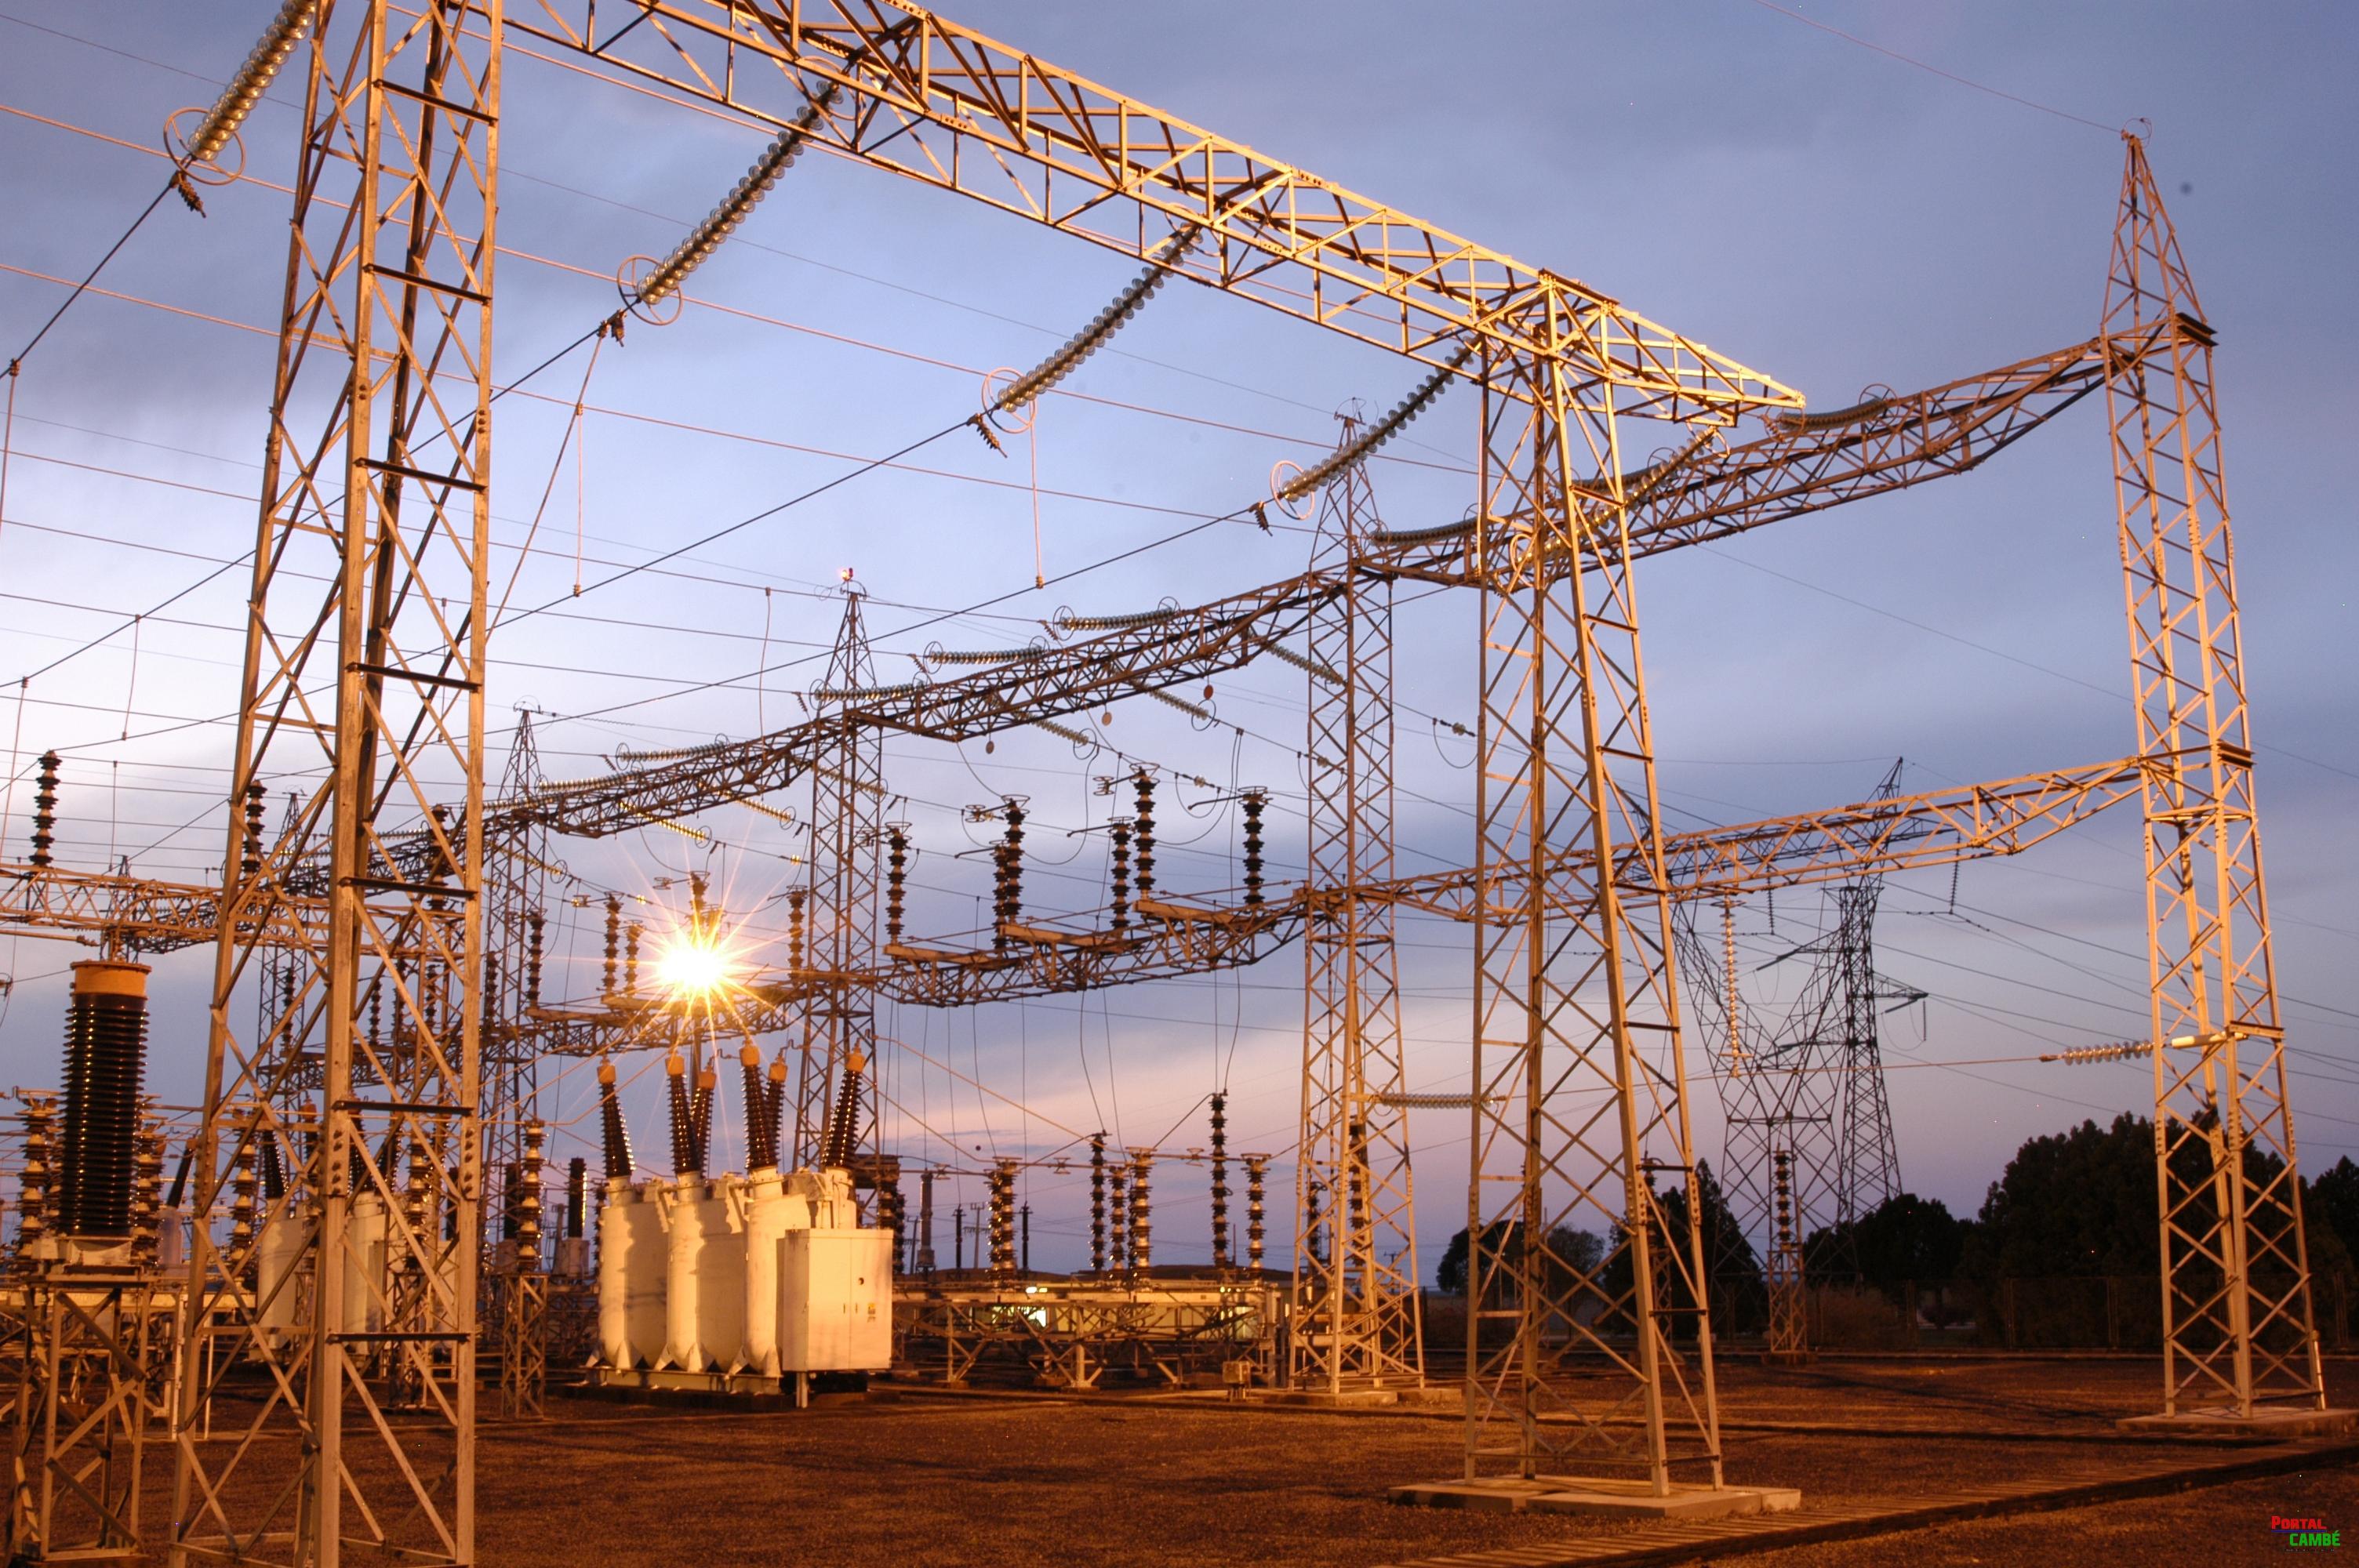 Conta de luz residencial da Copel terá desconto de 11,8% em abril